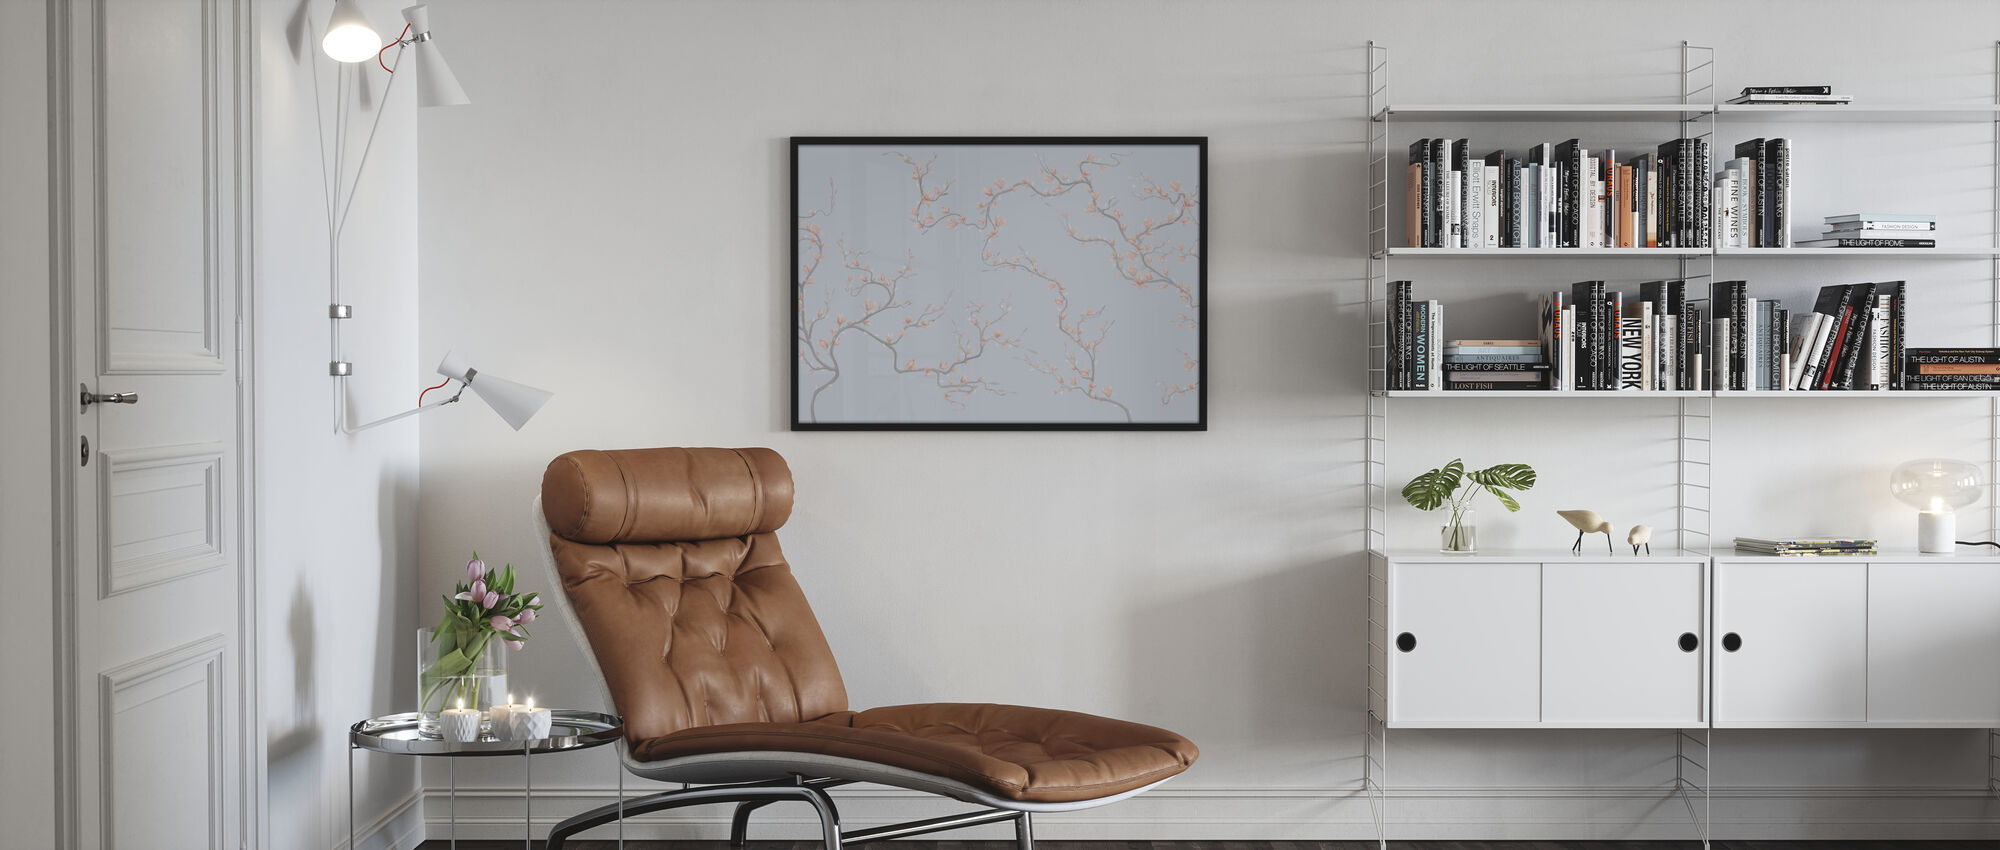 Flourishing Magnolia - Pale Blue - Poster - Living Room